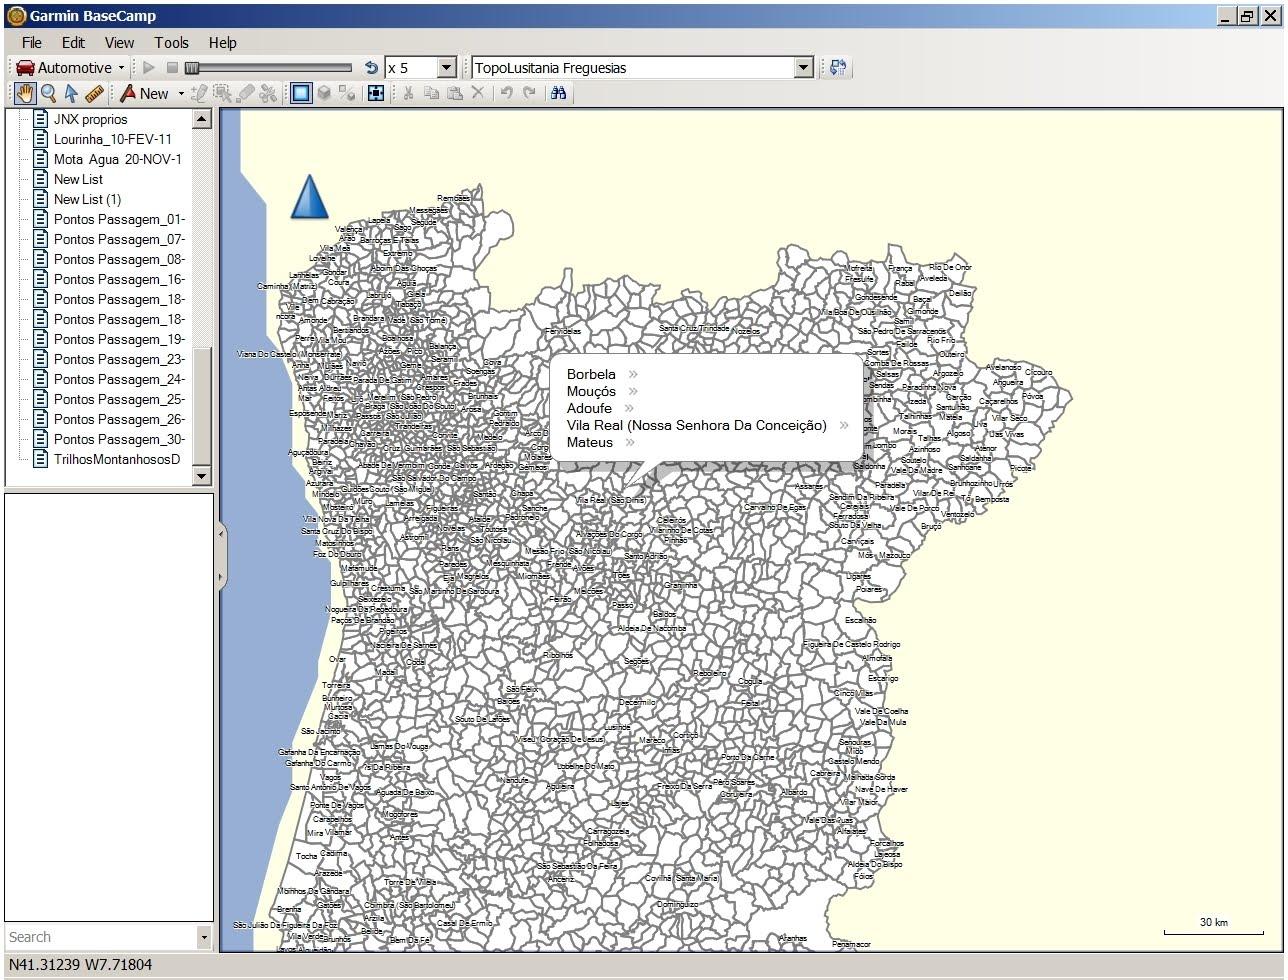 mapa freguesias de portugal TopoLusitania   Mapa Topográfico de Portugal para GPS em formato  mapa freguesias de portugal